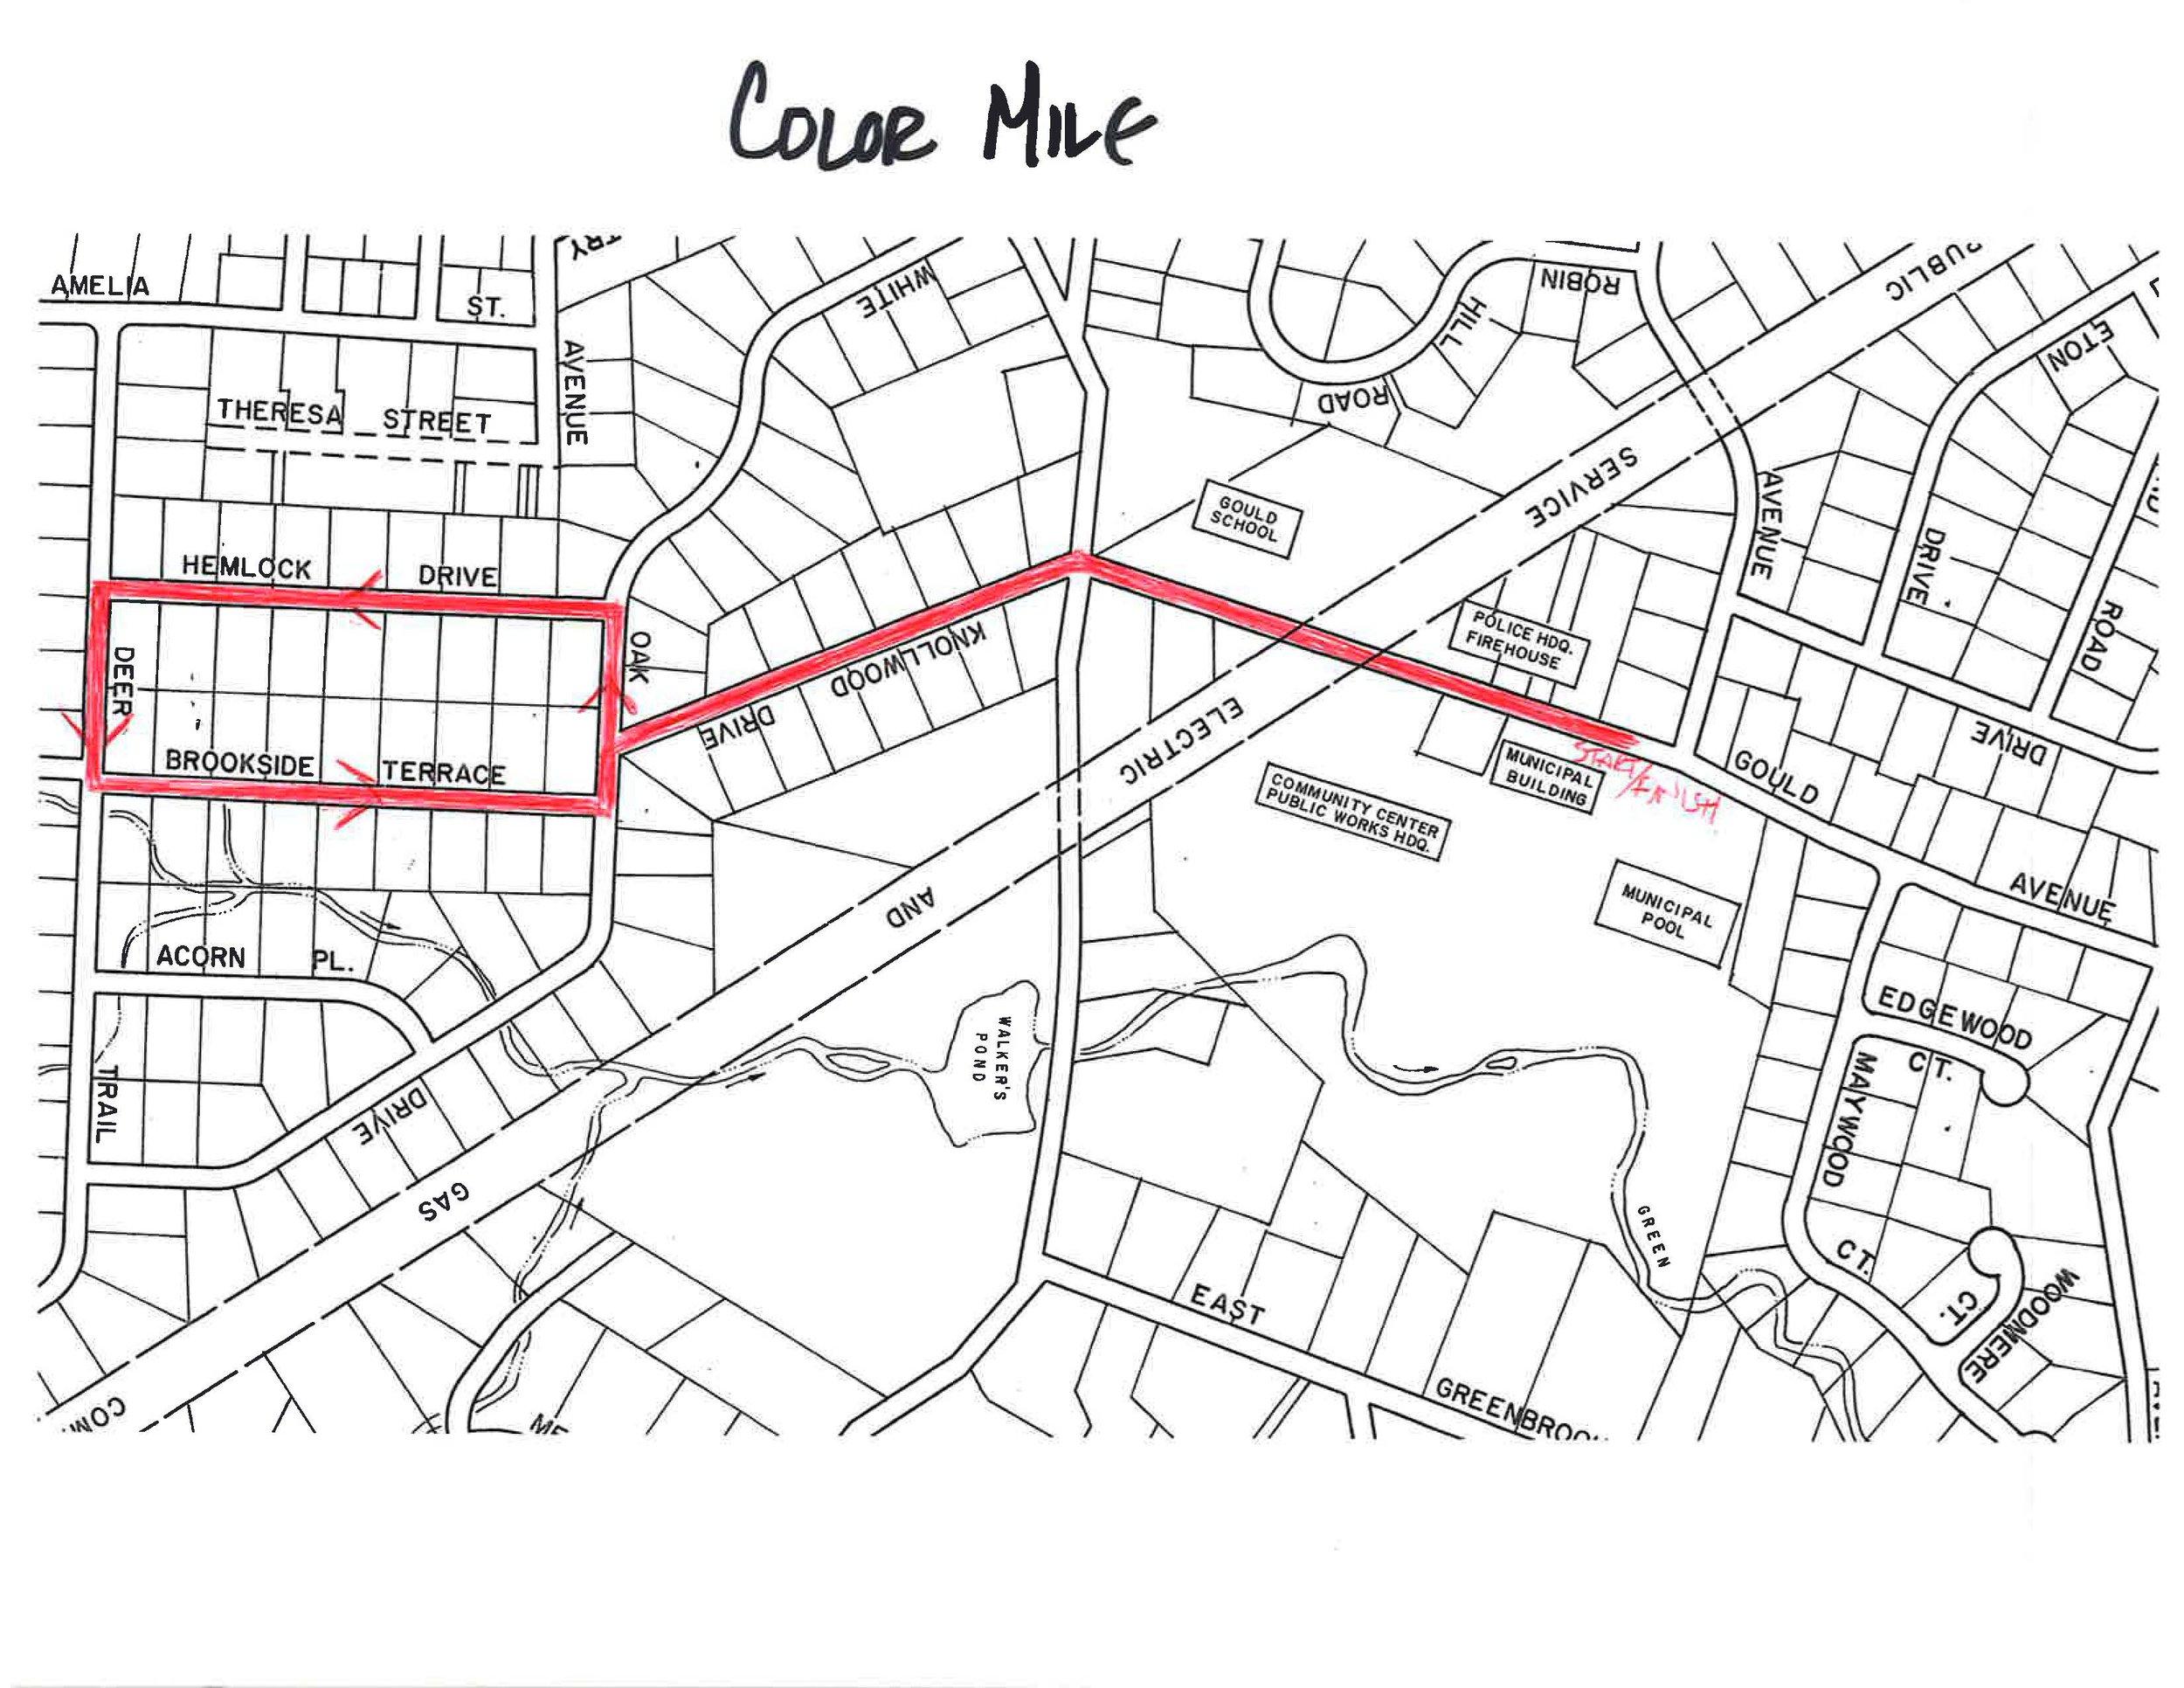 color mile route.jpg